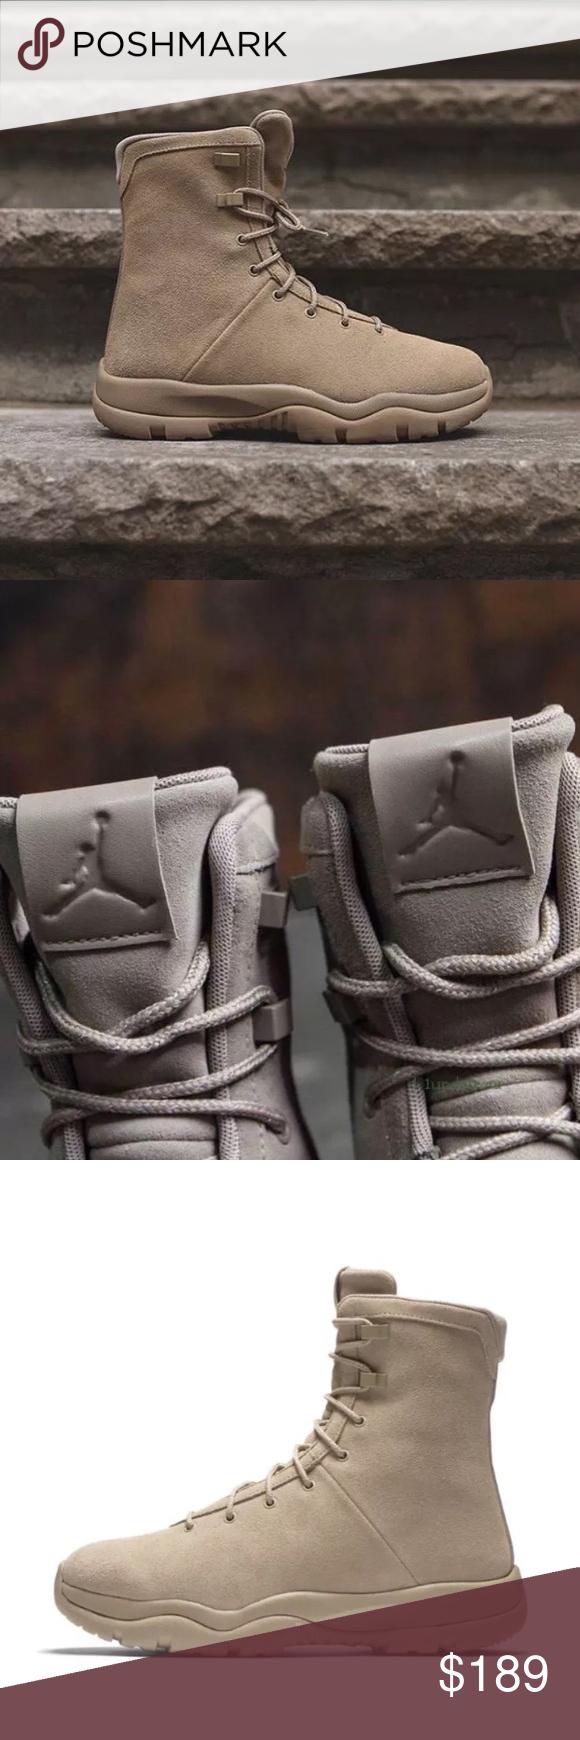 856b3c68ee9 Nike Air Jordan Future Boot EP Khaki Suede Tan Brand New without Box ...